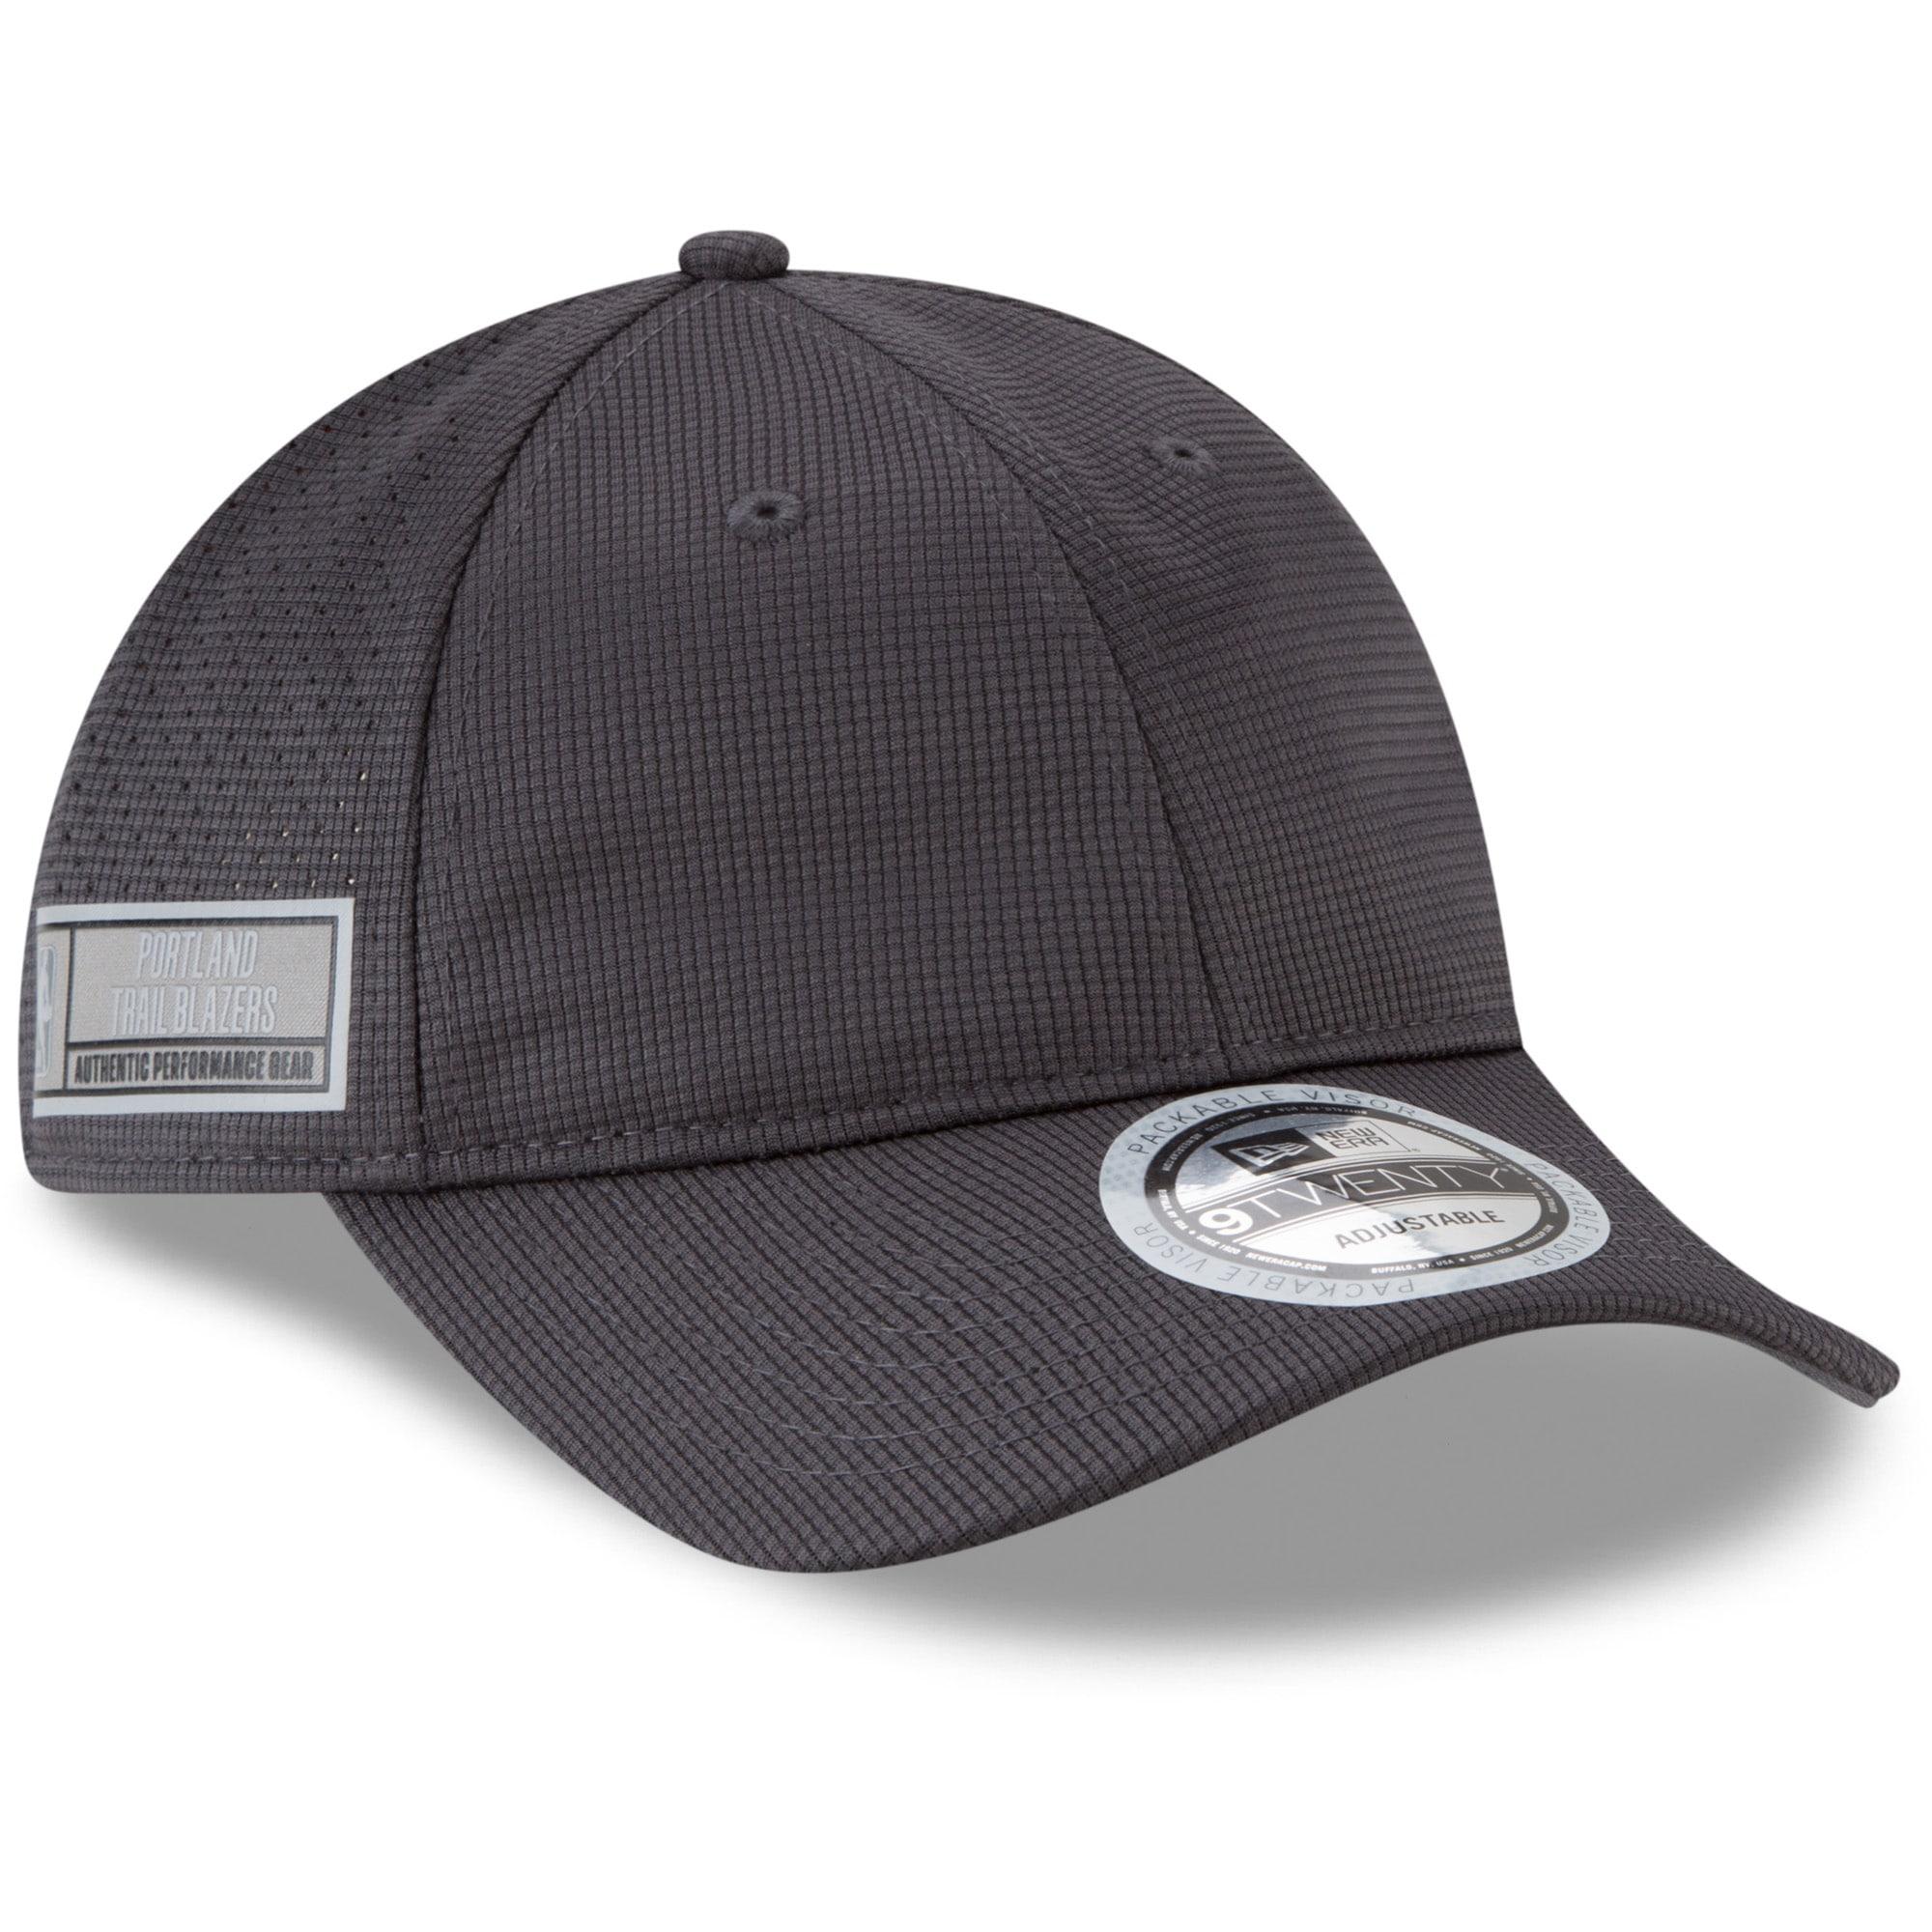 Portland Trail Blazers New Era Authentics Training 9TWENTY Adjustable Hat - Graphite